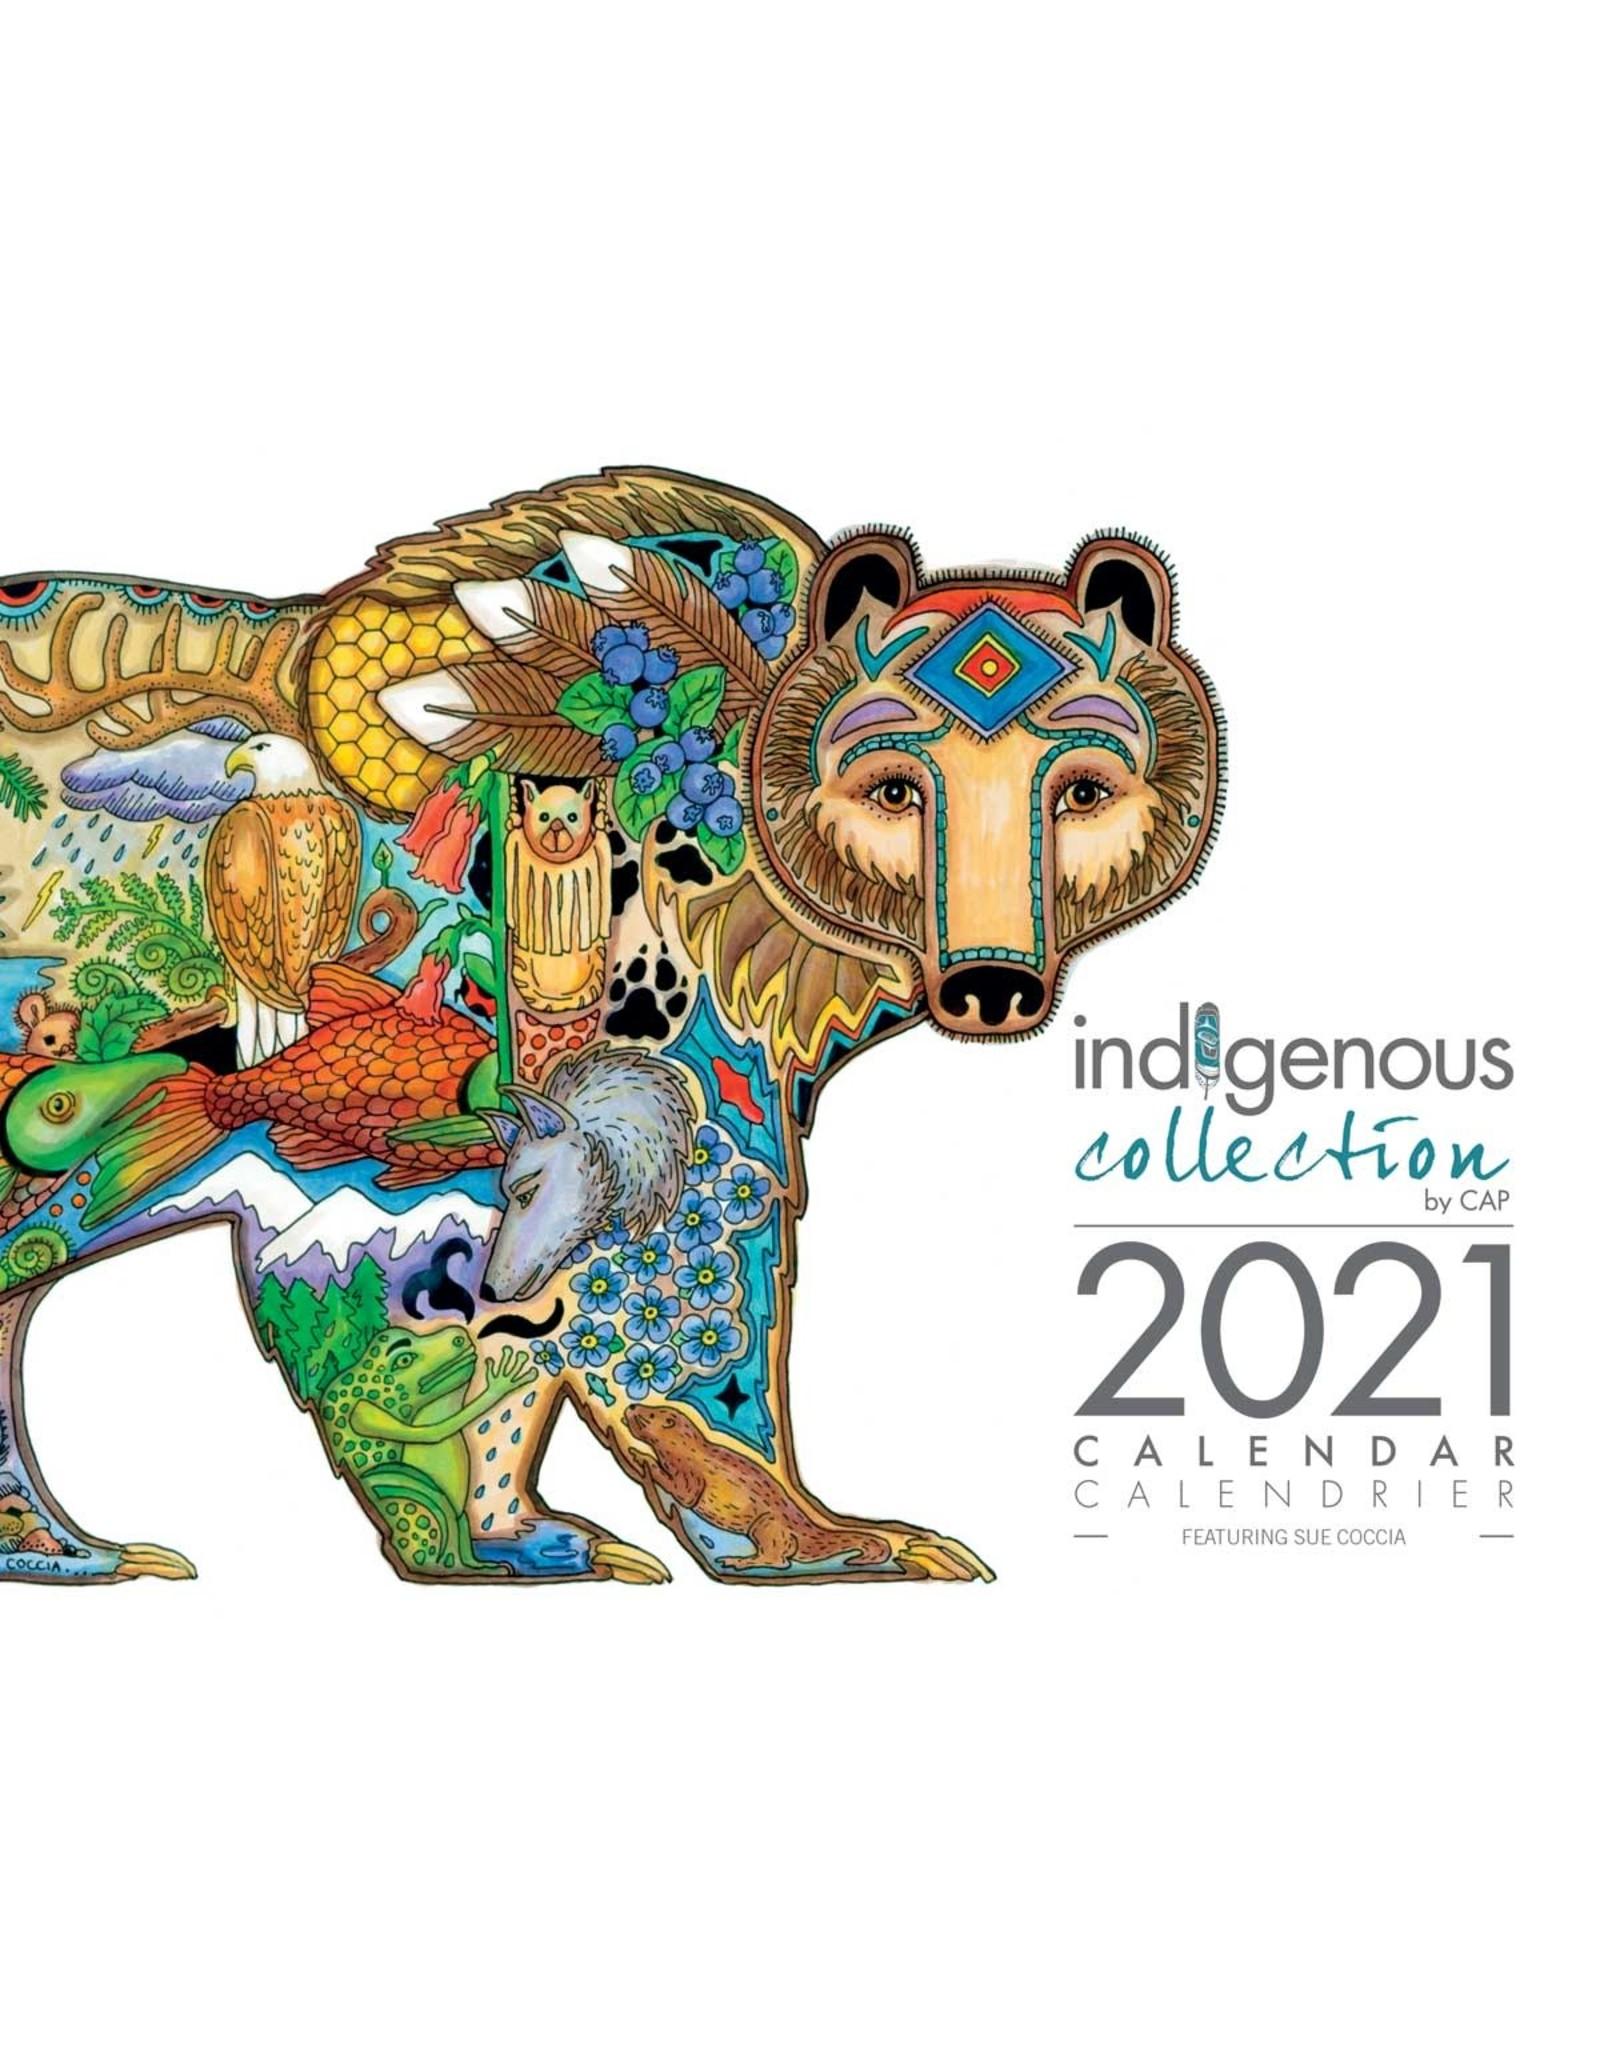 Sue Coccia 2021 Calendar   CAL 113   La Boutique Boréale